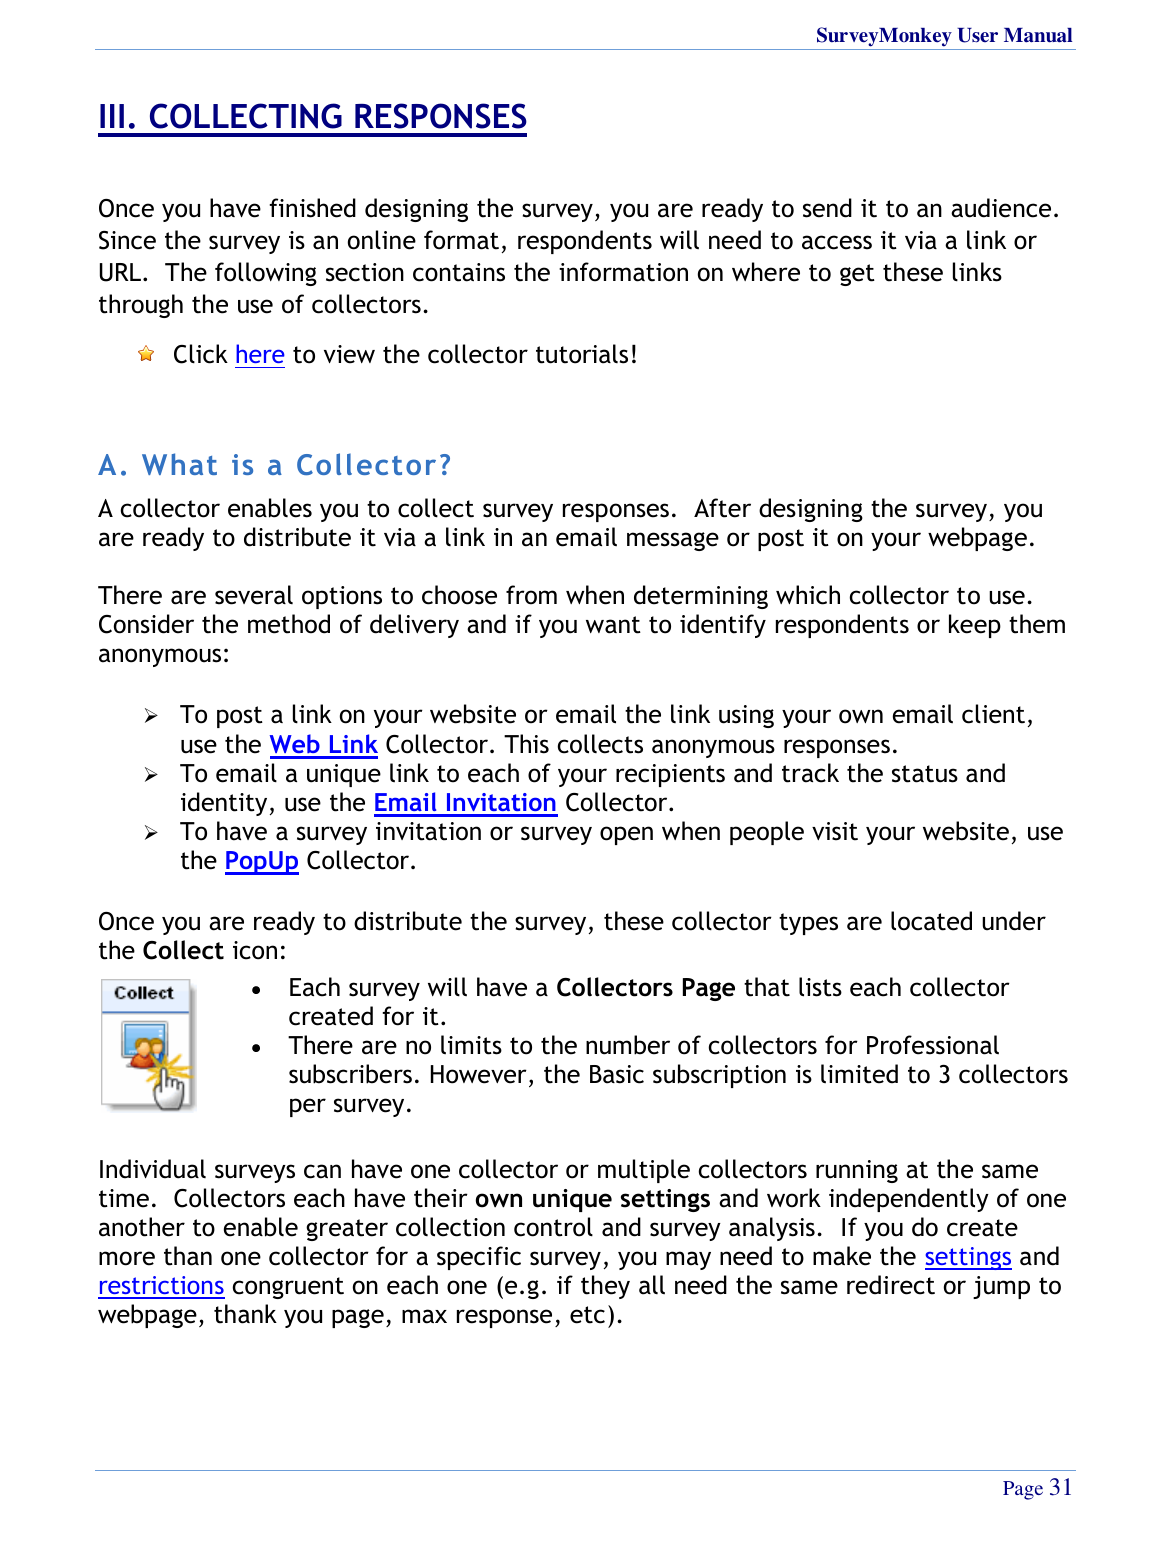 Surveymonkey 2009 Users Manual